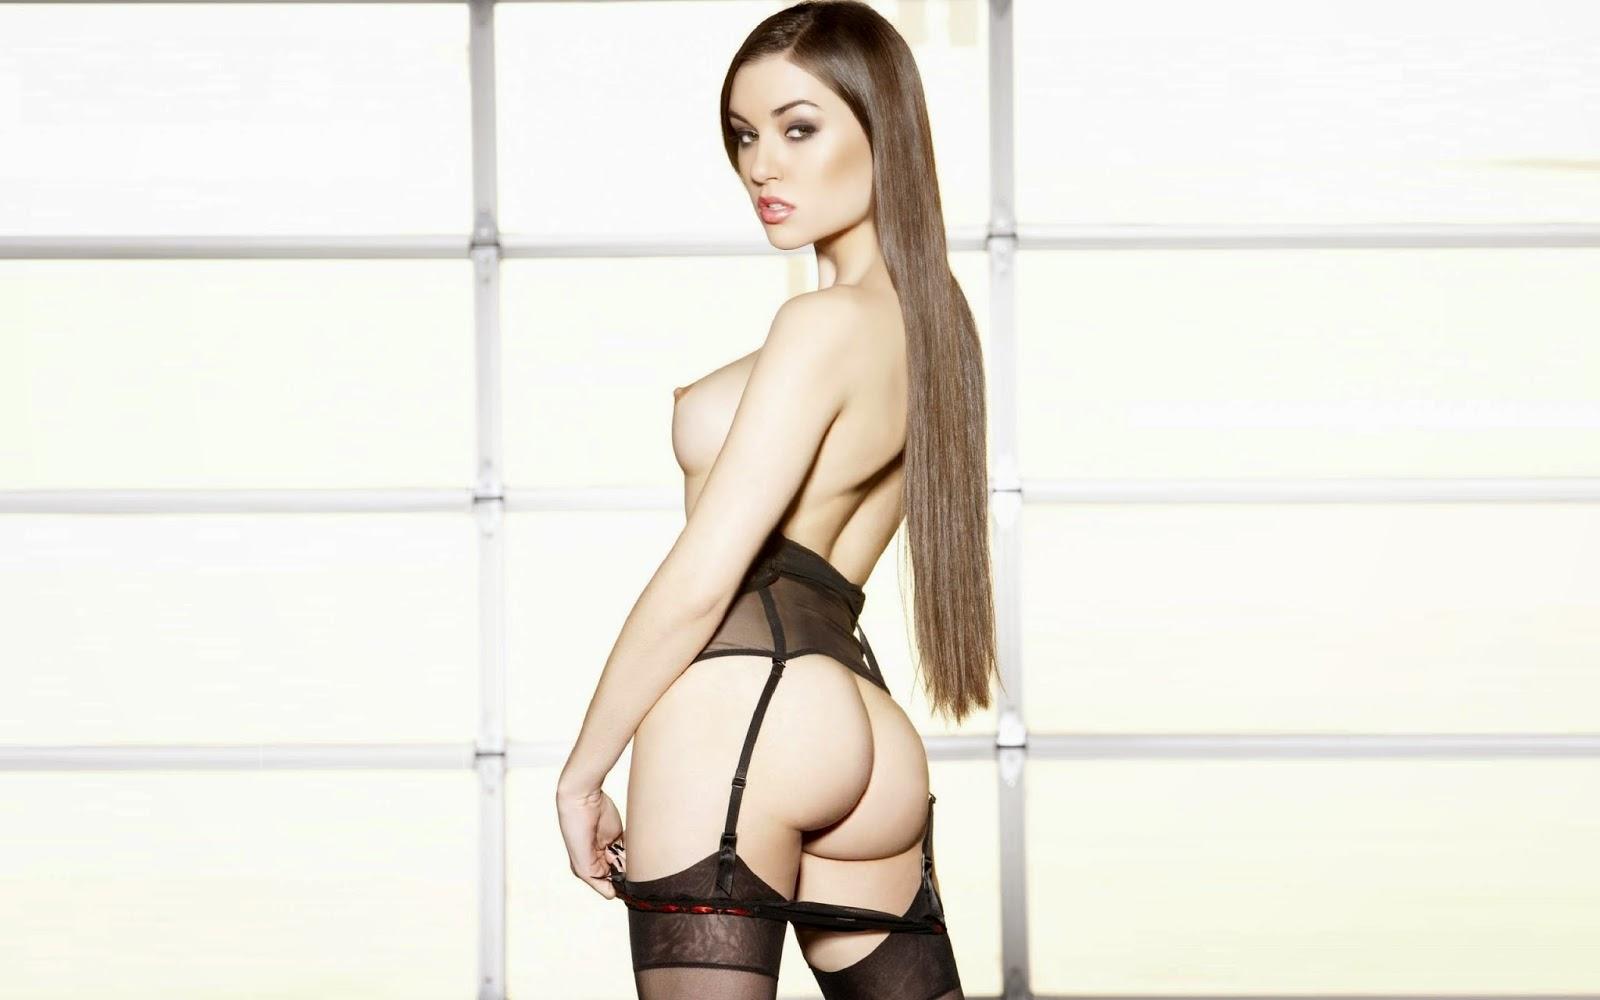 Girls xxx 1080p sexy hd wallpapers